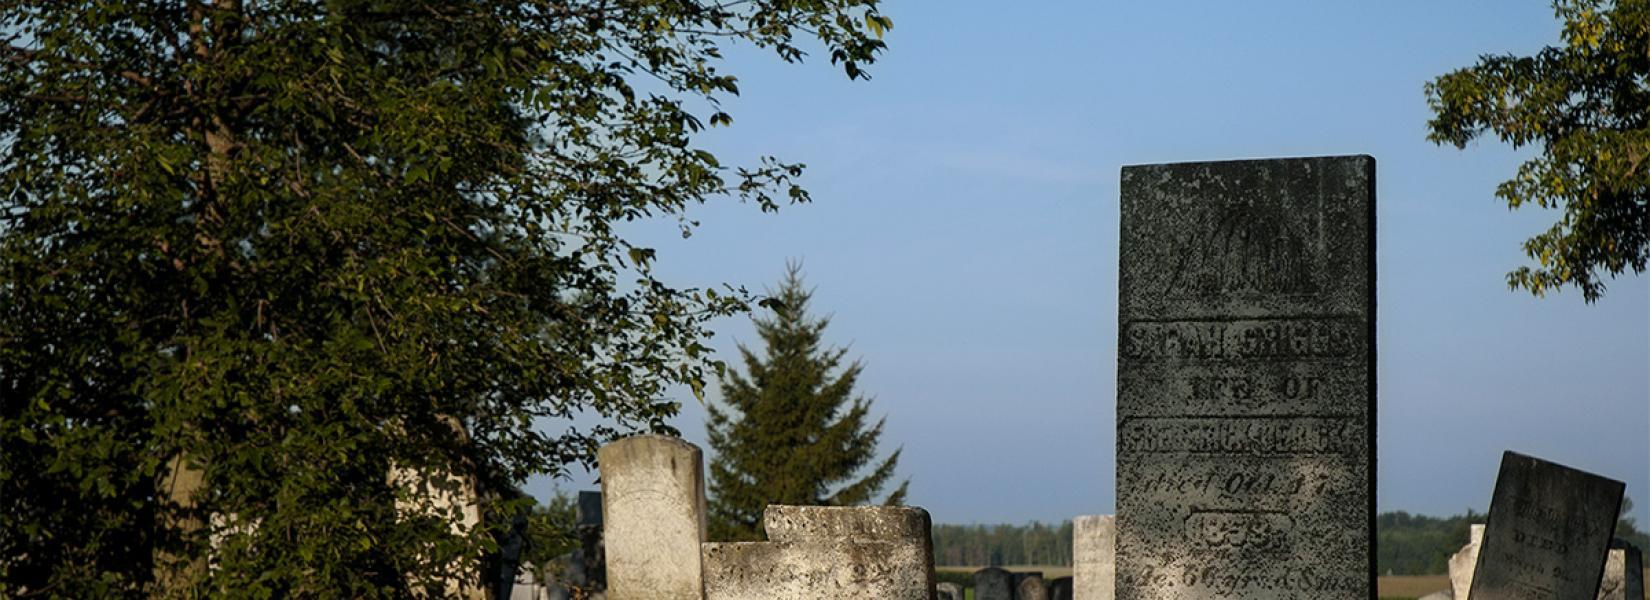 Miranda cemetery on the 3rd concession road - Fadden Corner (Noyan)